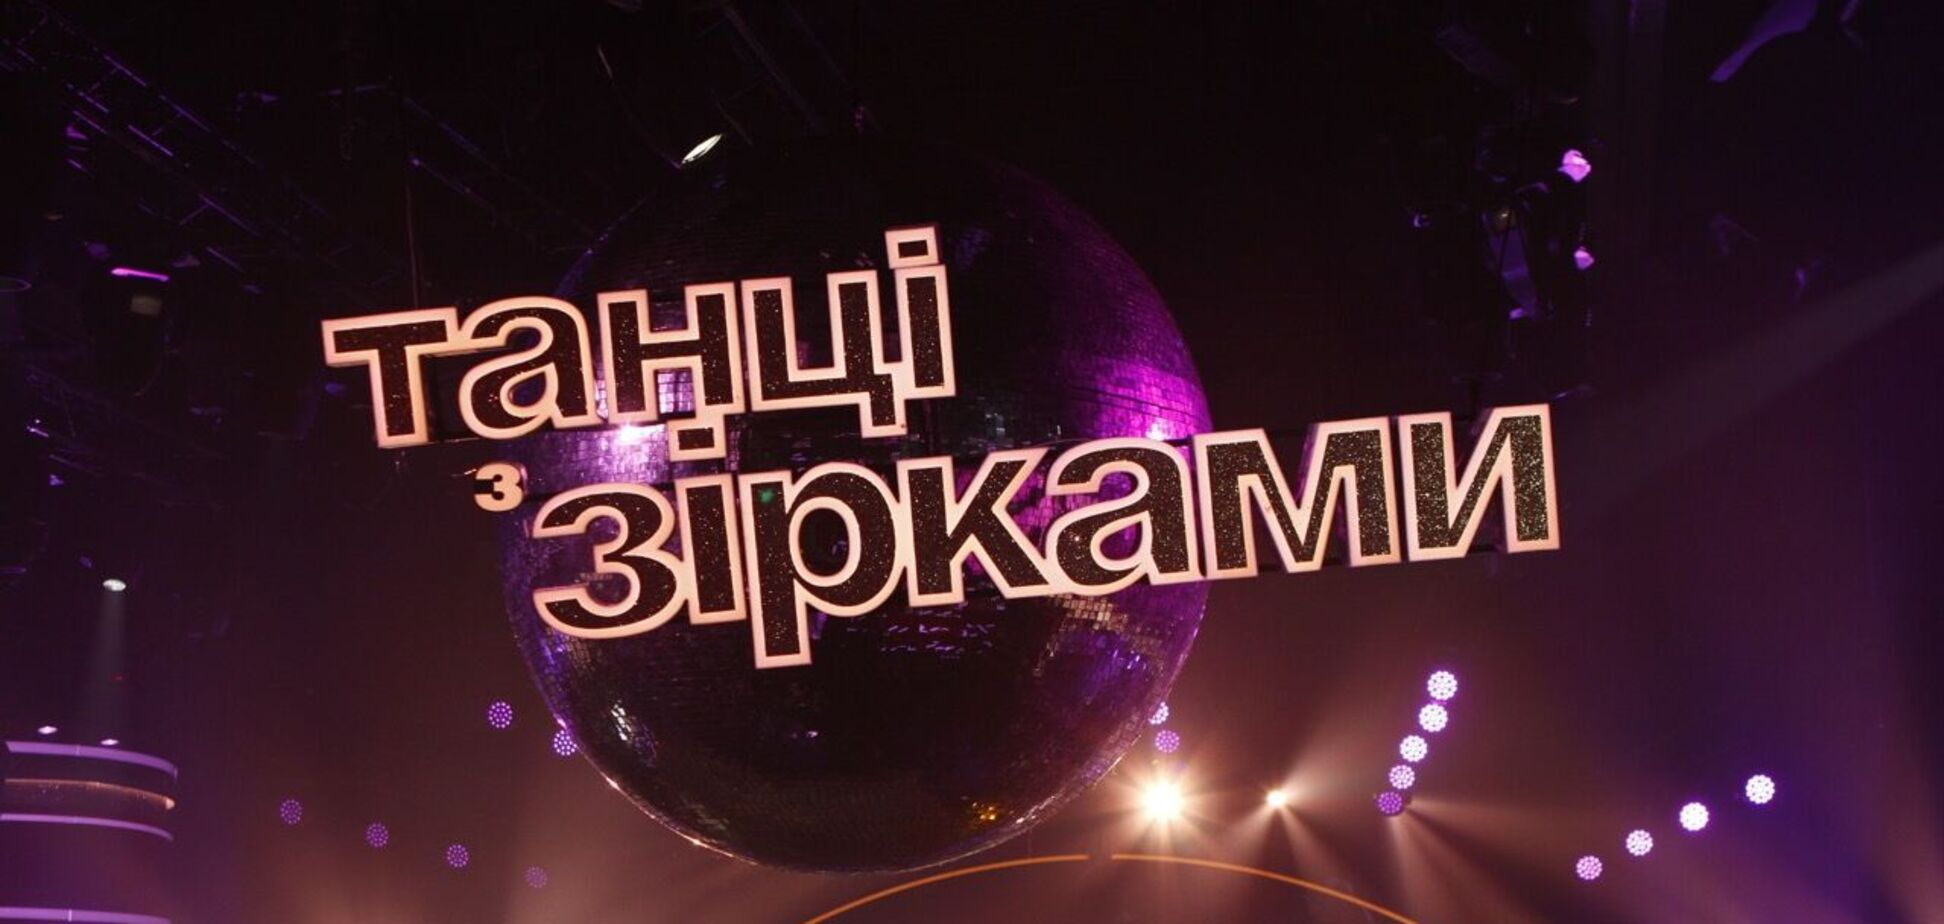 Результат финала 'Танців з зірками' и поступок Димопулос вызвали споры среди зрителей